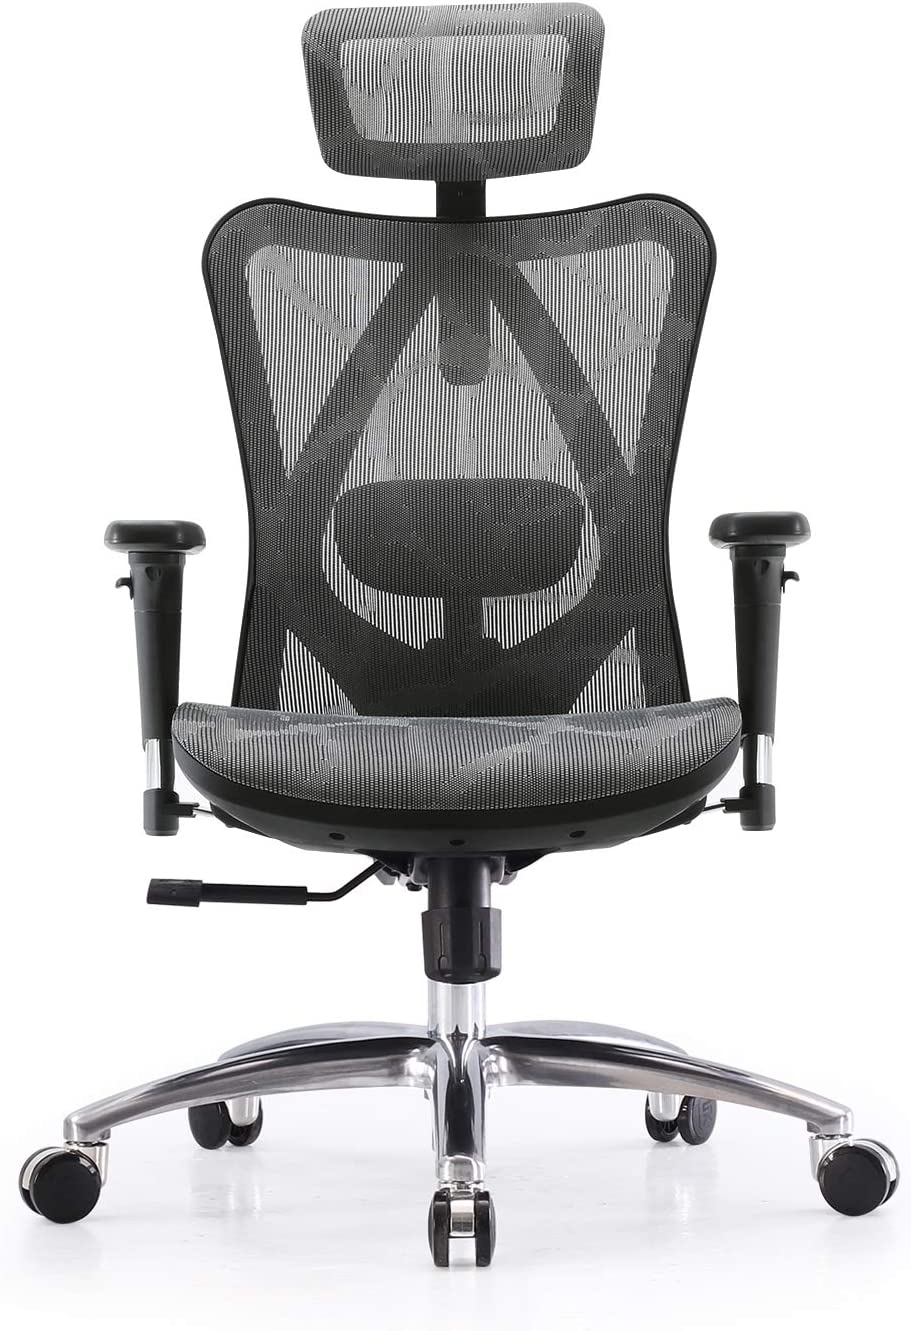 SIHOO Ergonomic Home Office Chair Adjustable Lumbar Support 3D Armrests Computer Desk Chair Skin-Friendly Mesh Executive High Back Chair(Grey)